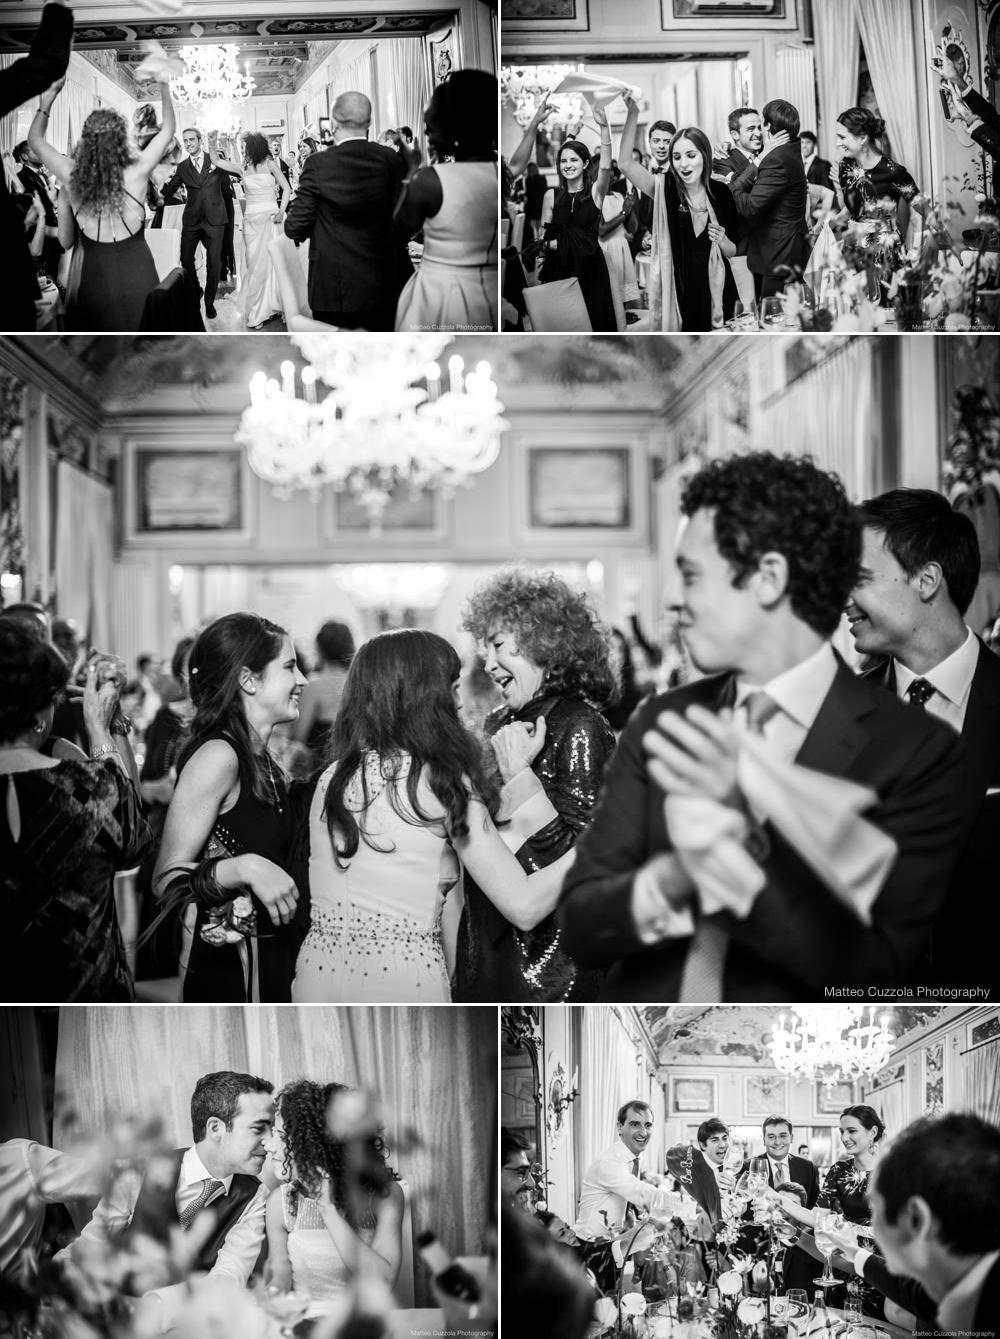 Wedding Villa Orsini Colonna Imbersago